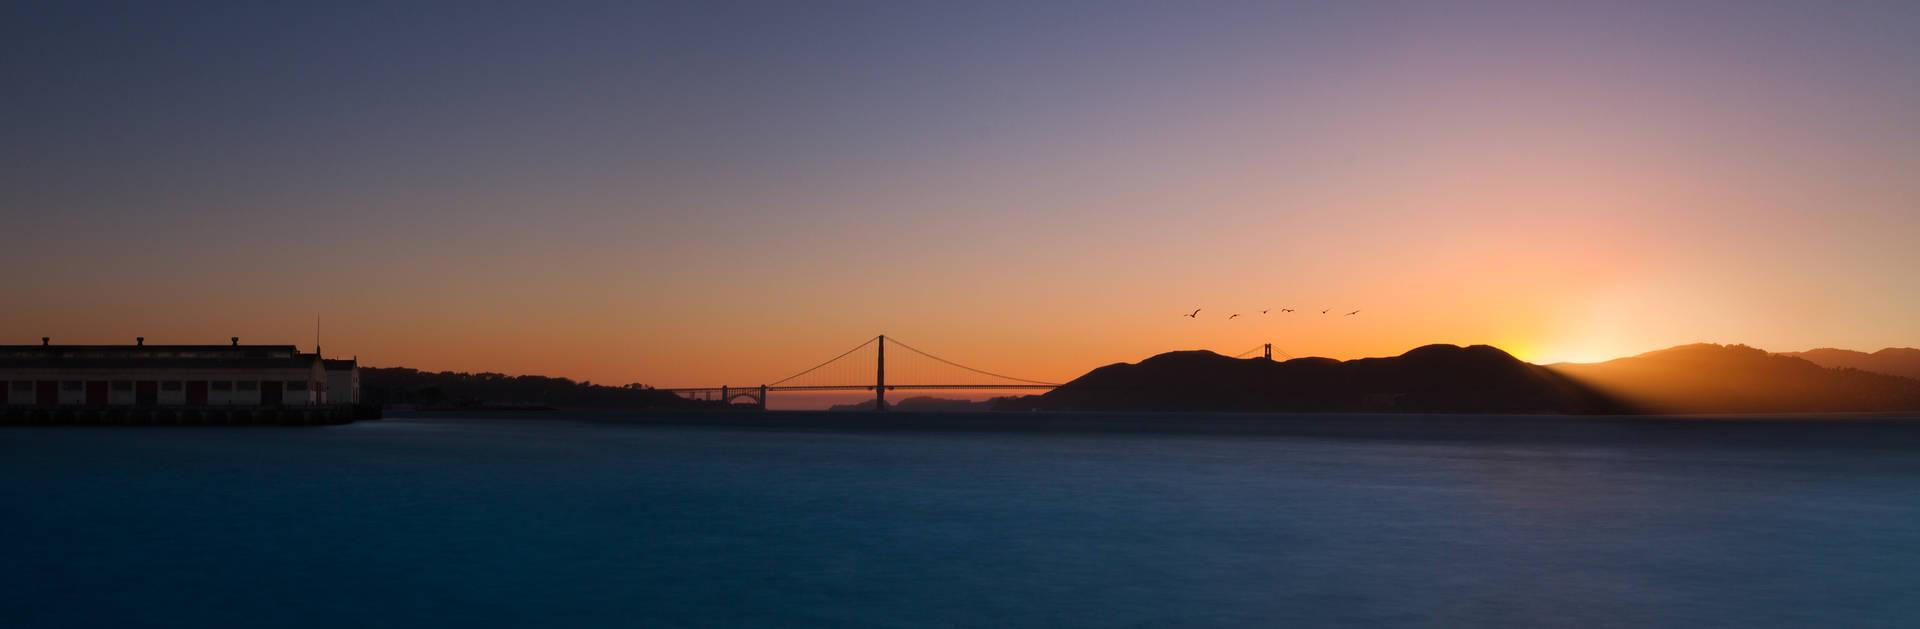 Golden Gate Bridge - San Fransisco